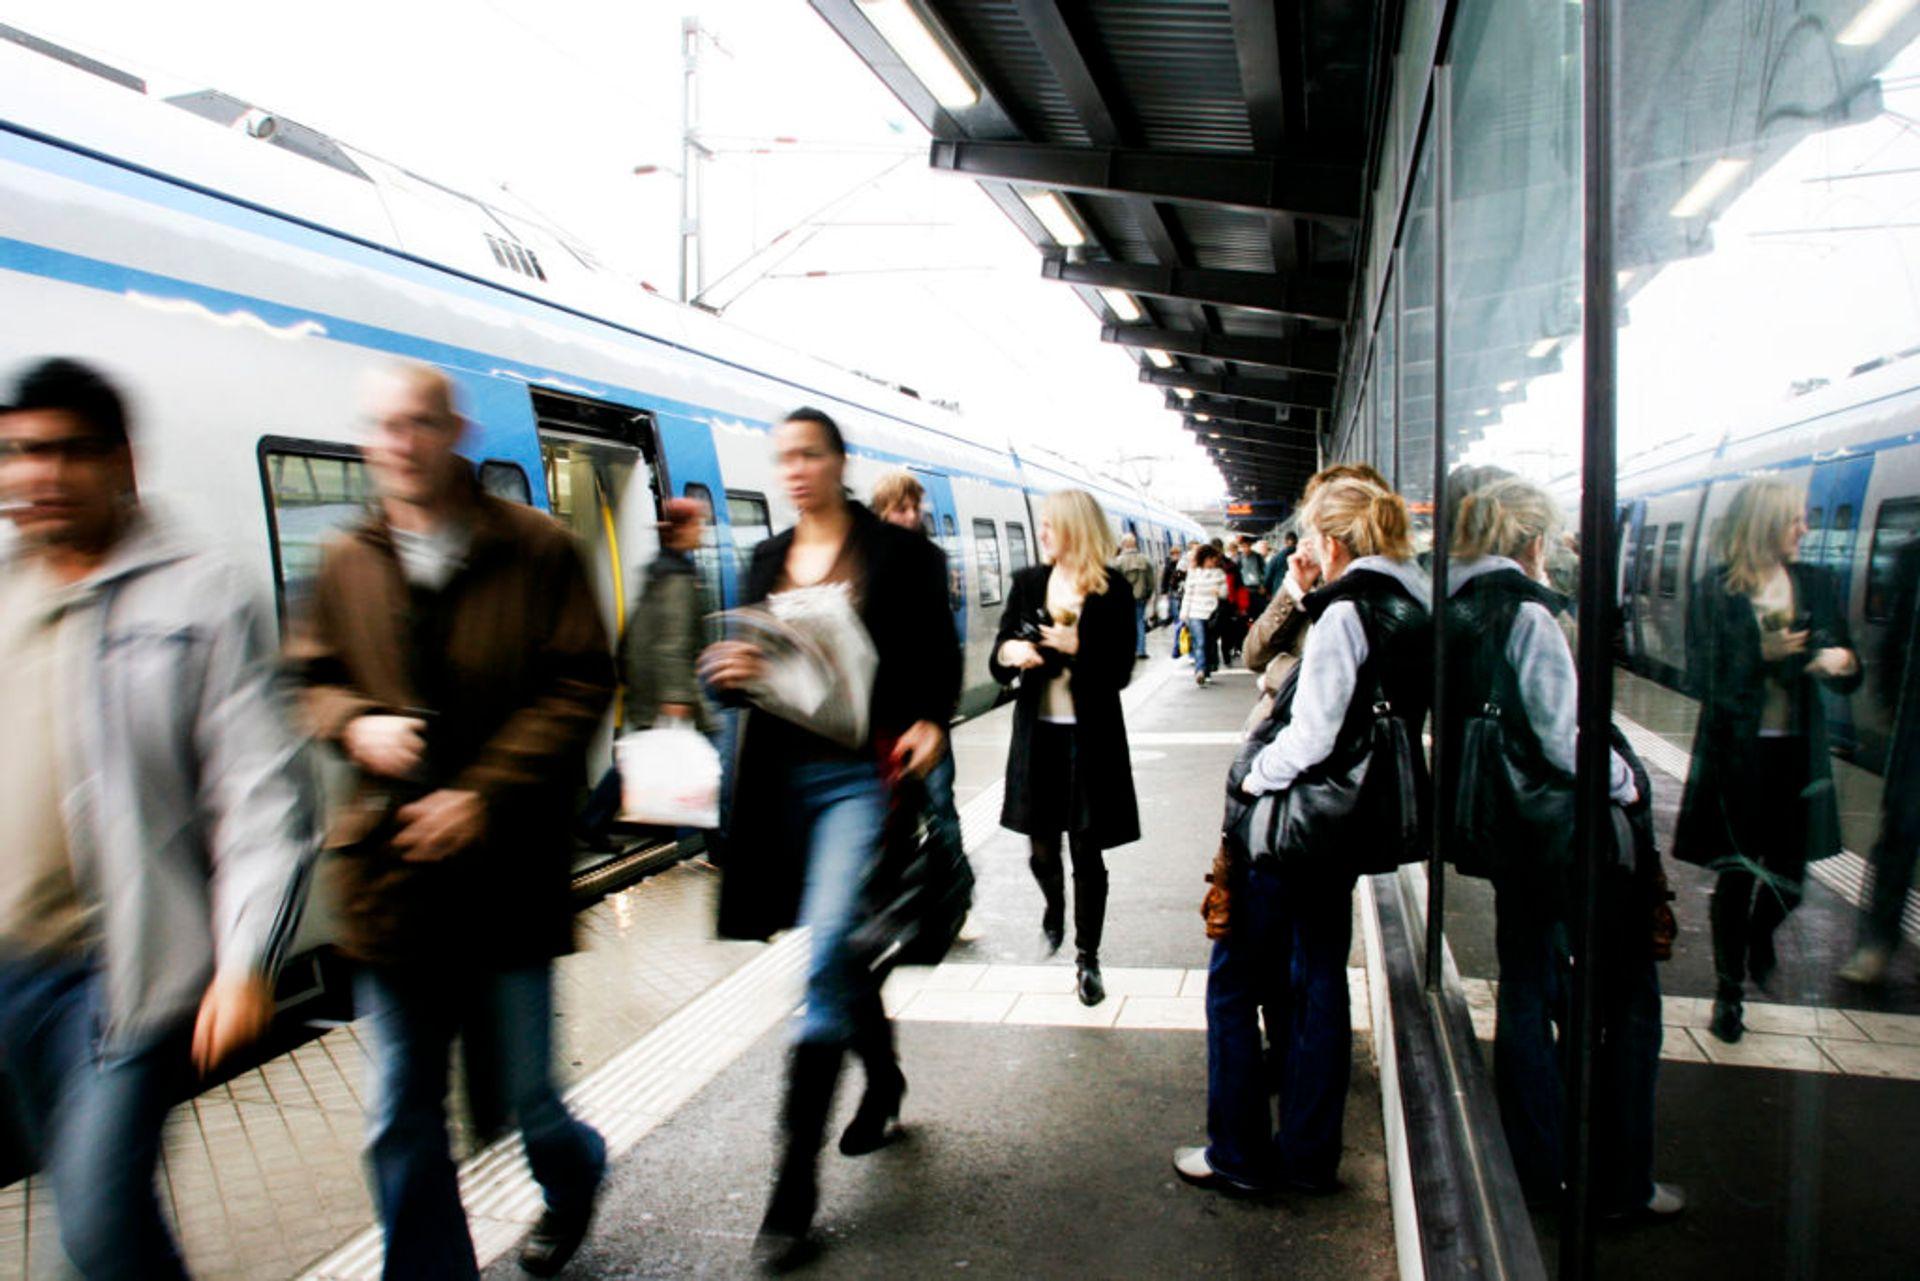 Commuters leaving a train.